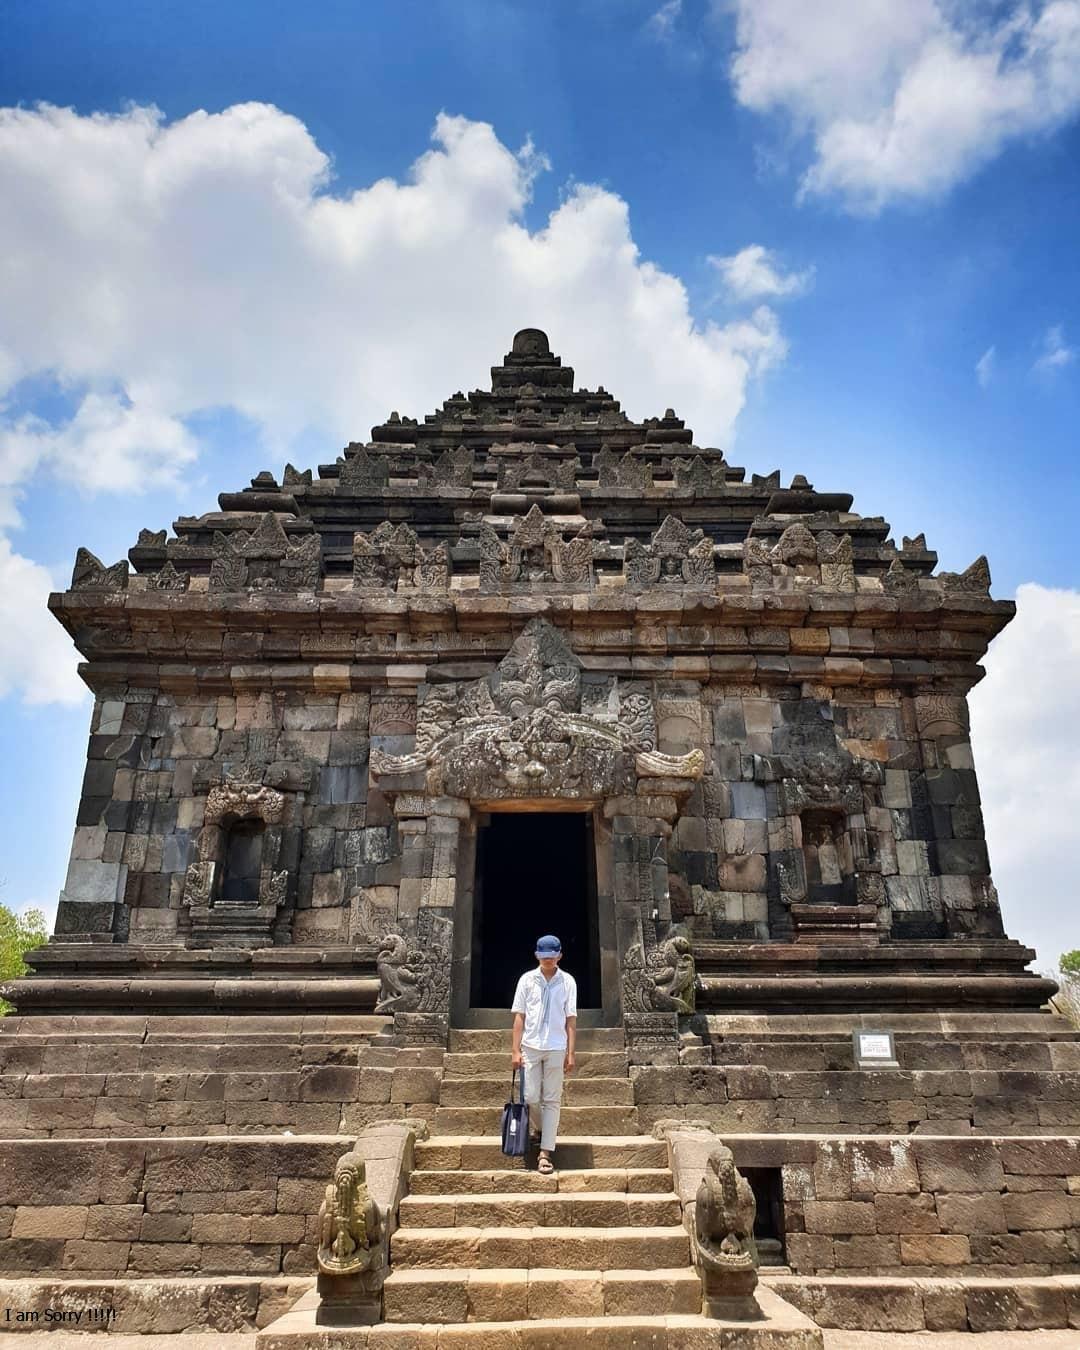 Candi Yogyakarta